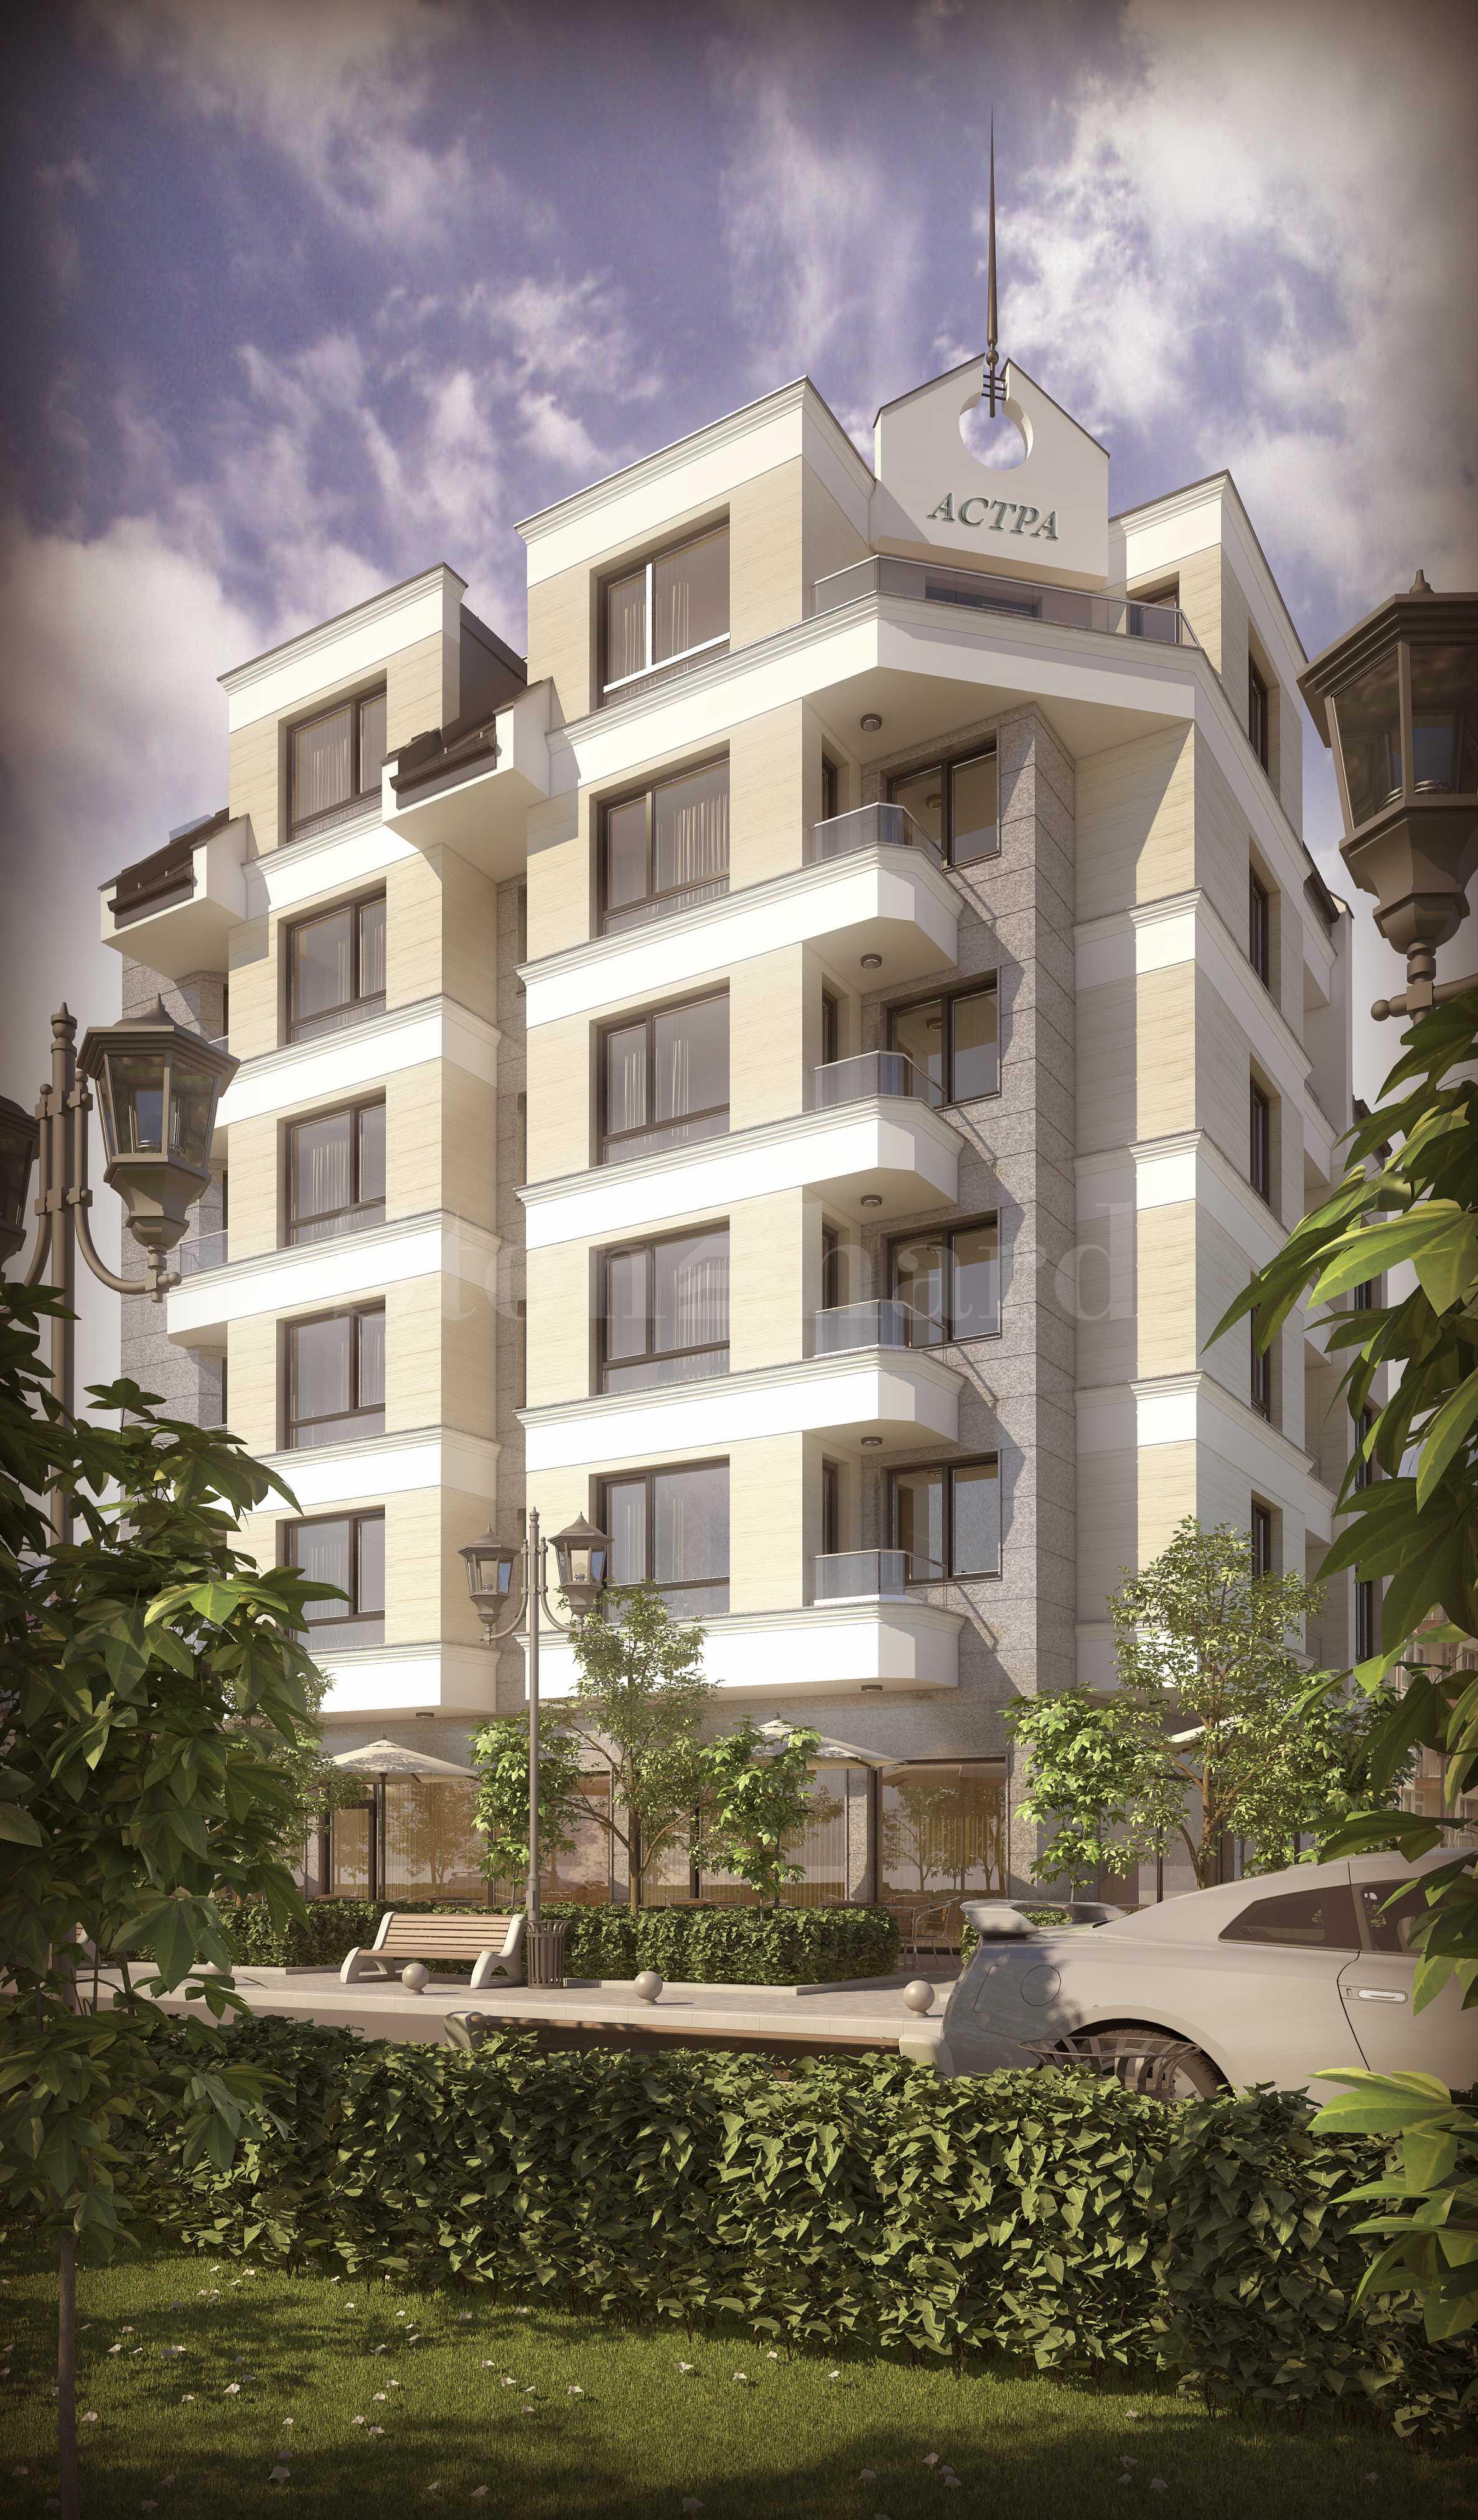 2-bedroom apartment in Sofia1 - Stonehard